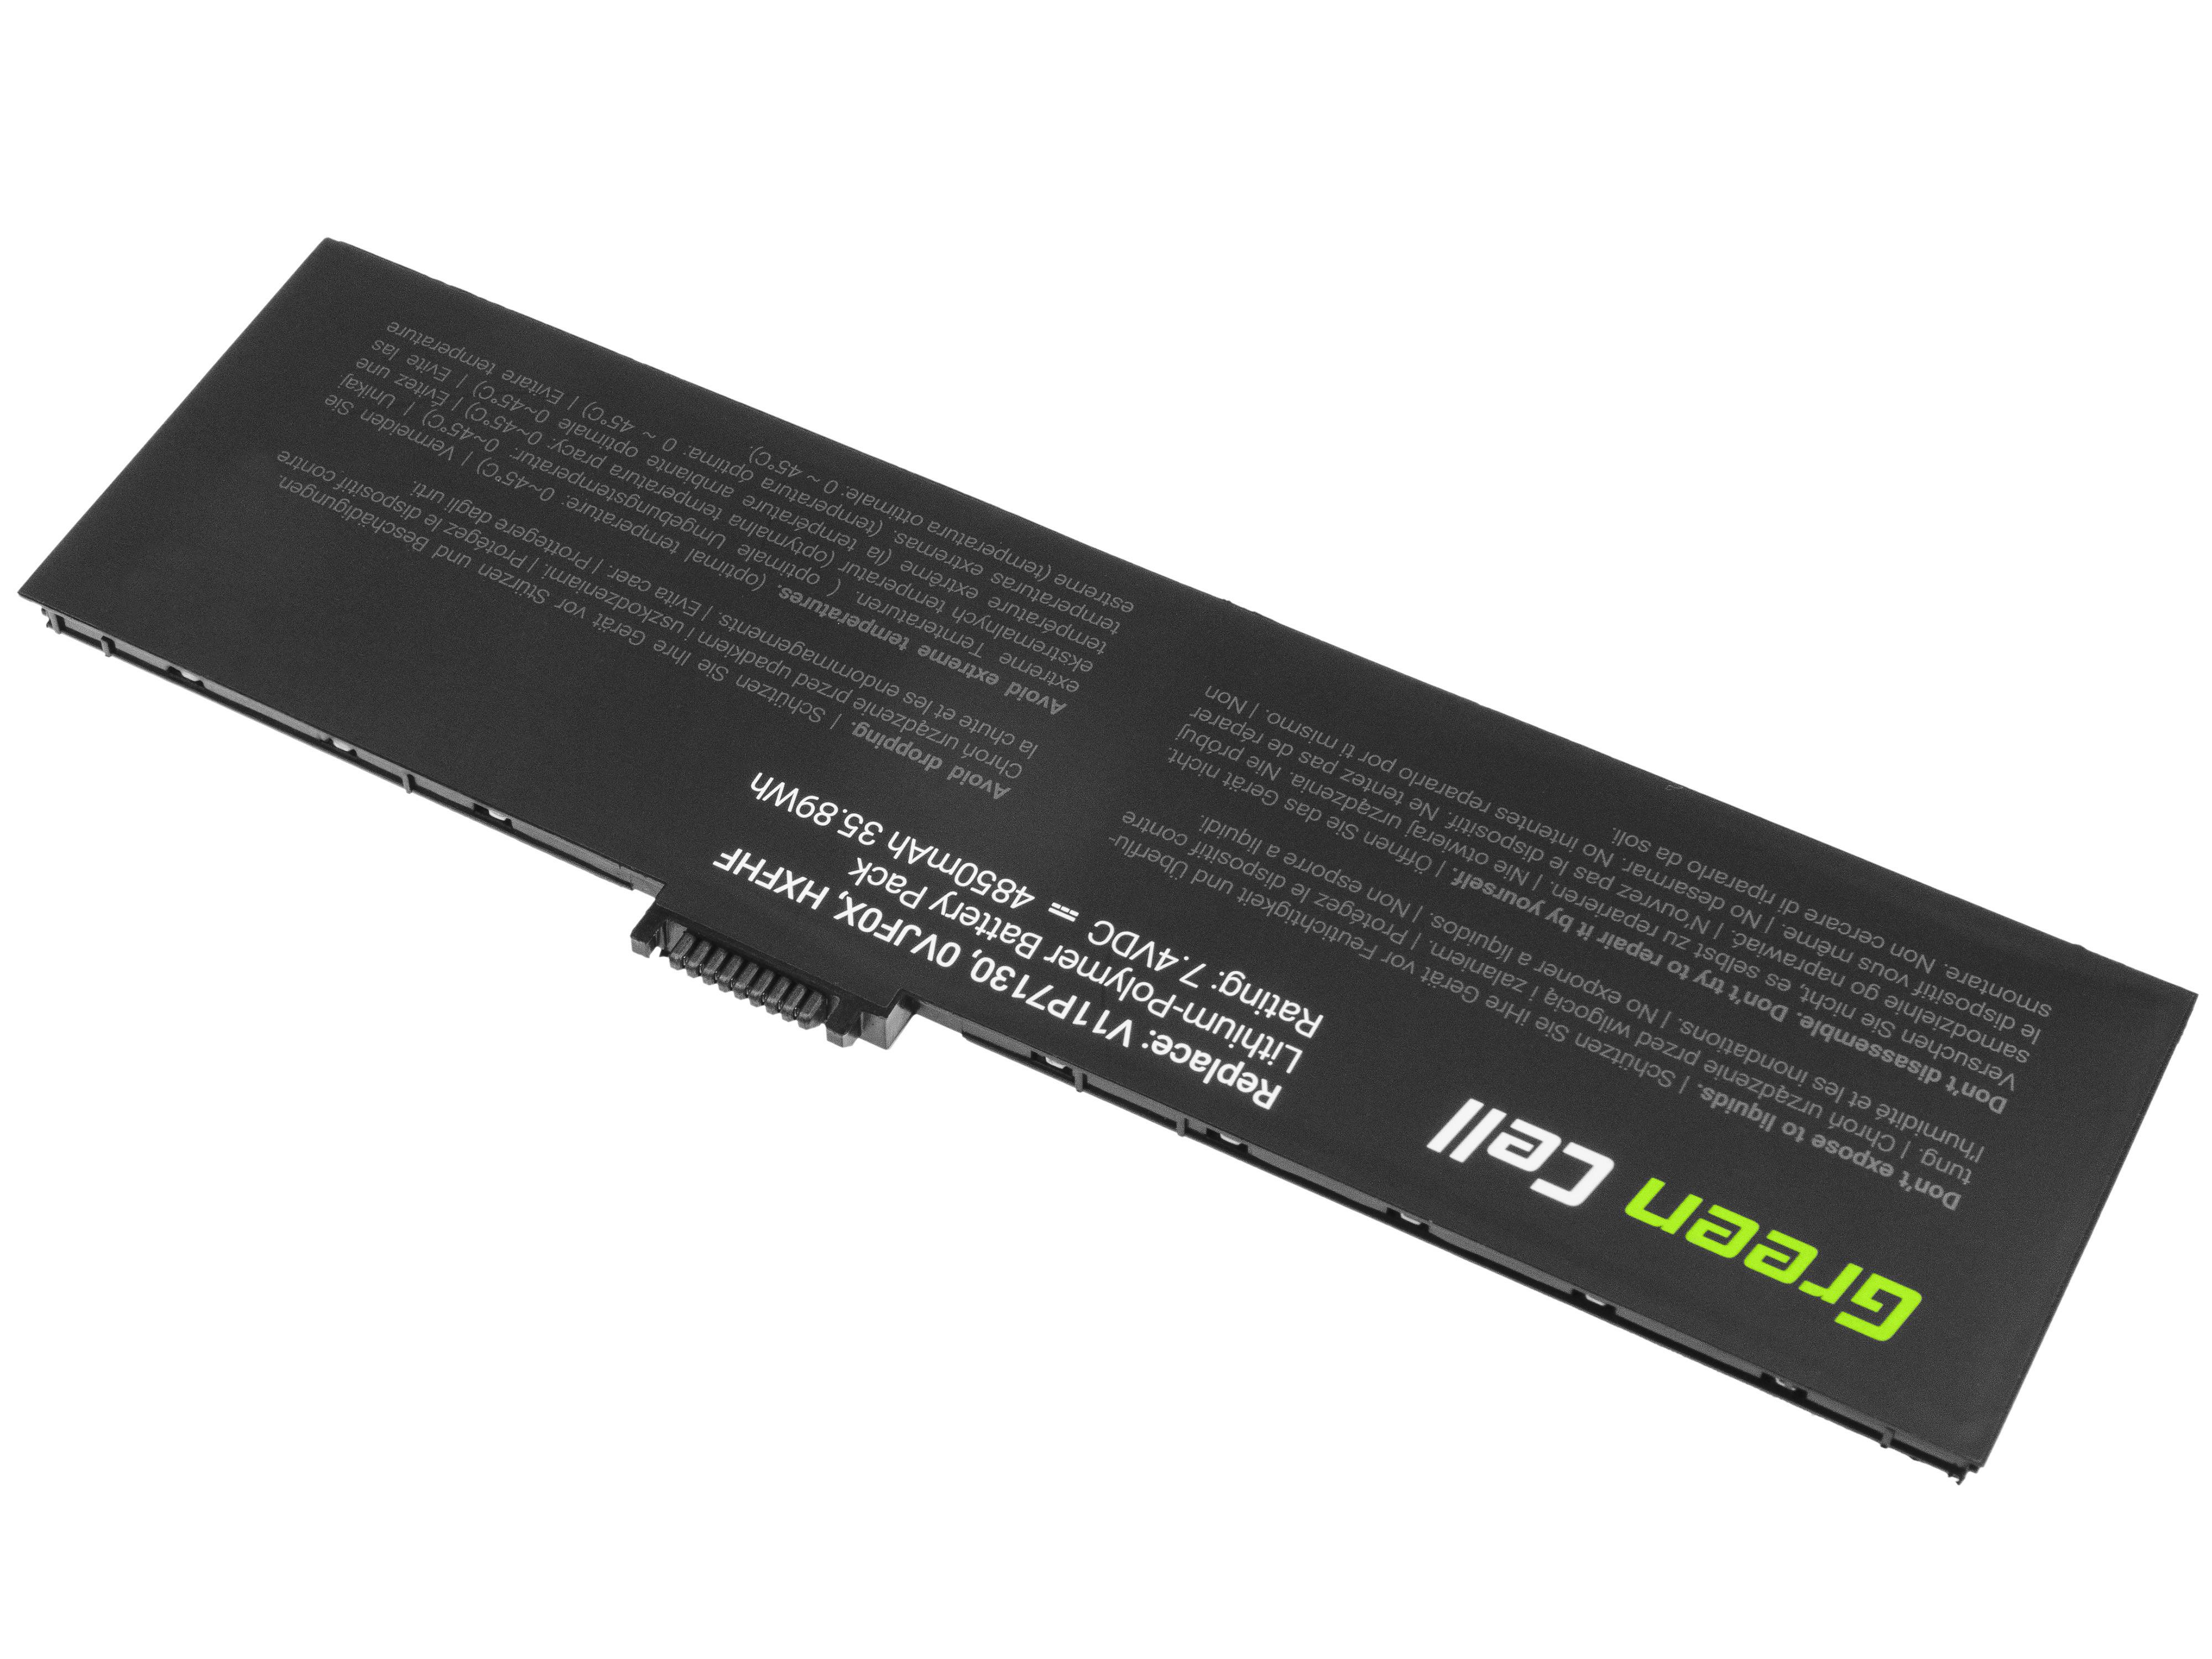 Green Cell TAB45 Baterie Dell HXFHF pro Dell Venue 11 Pro 7000 7130 7139 4850mAh Li-Pol – neoriginální